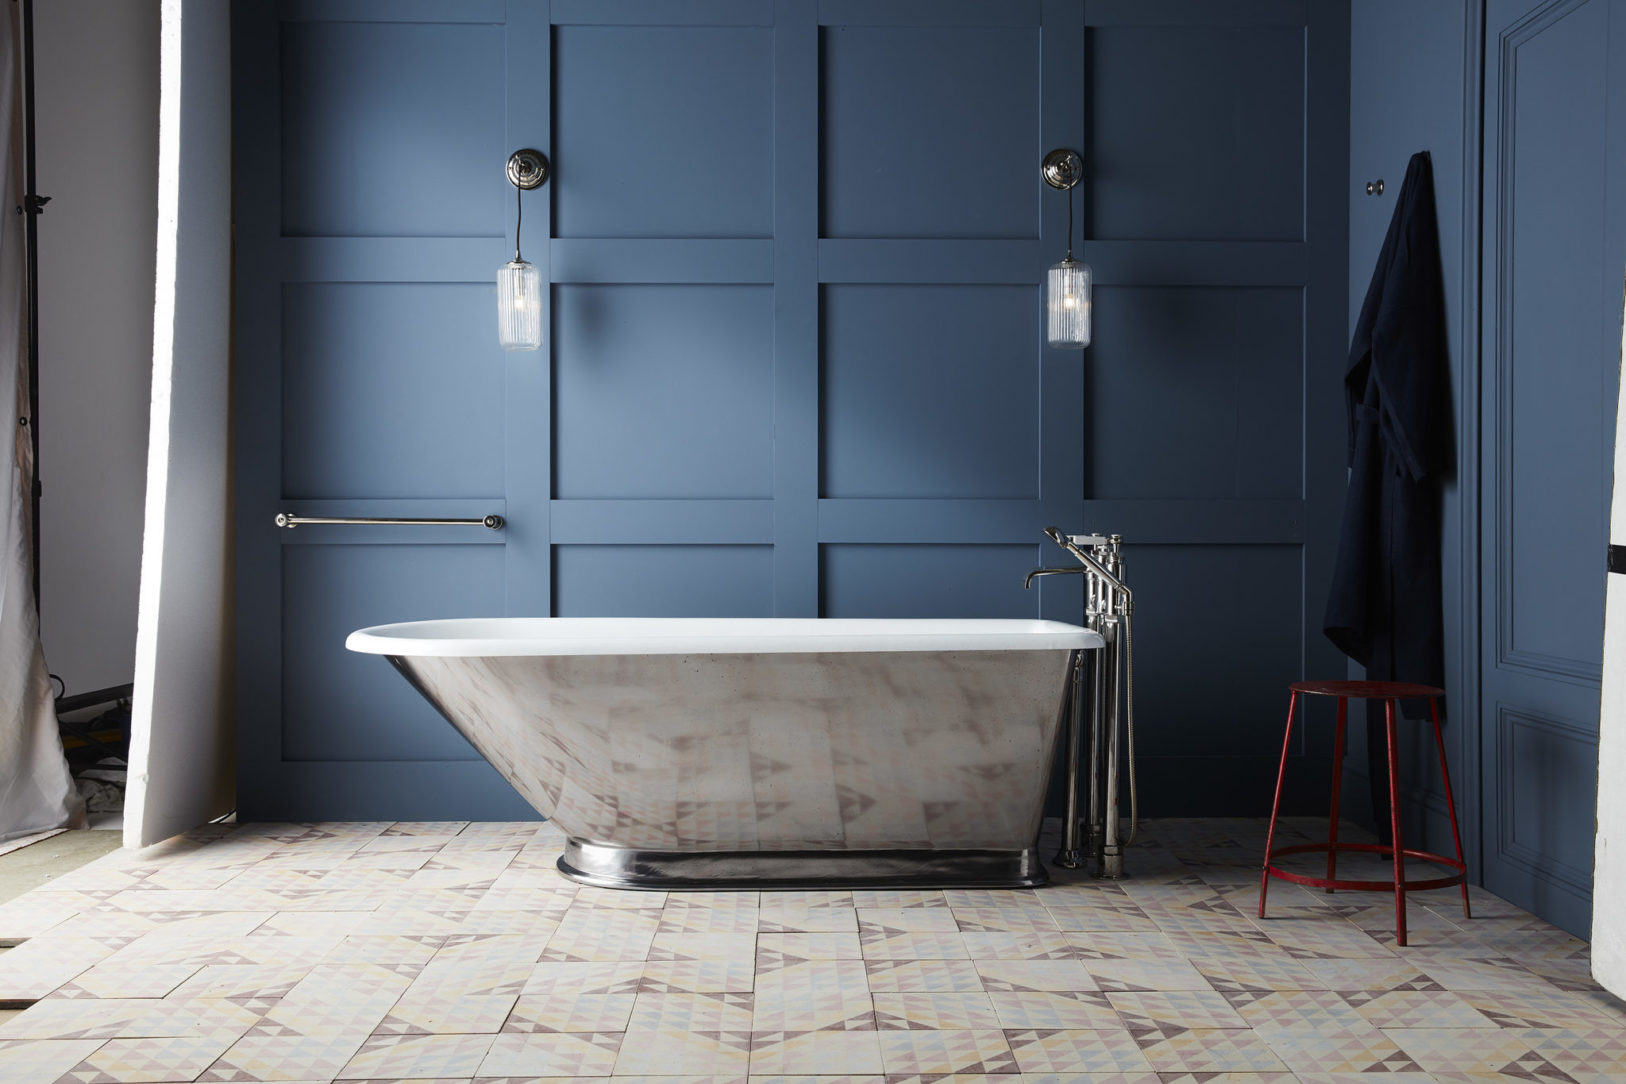 The Wandle Bathtub